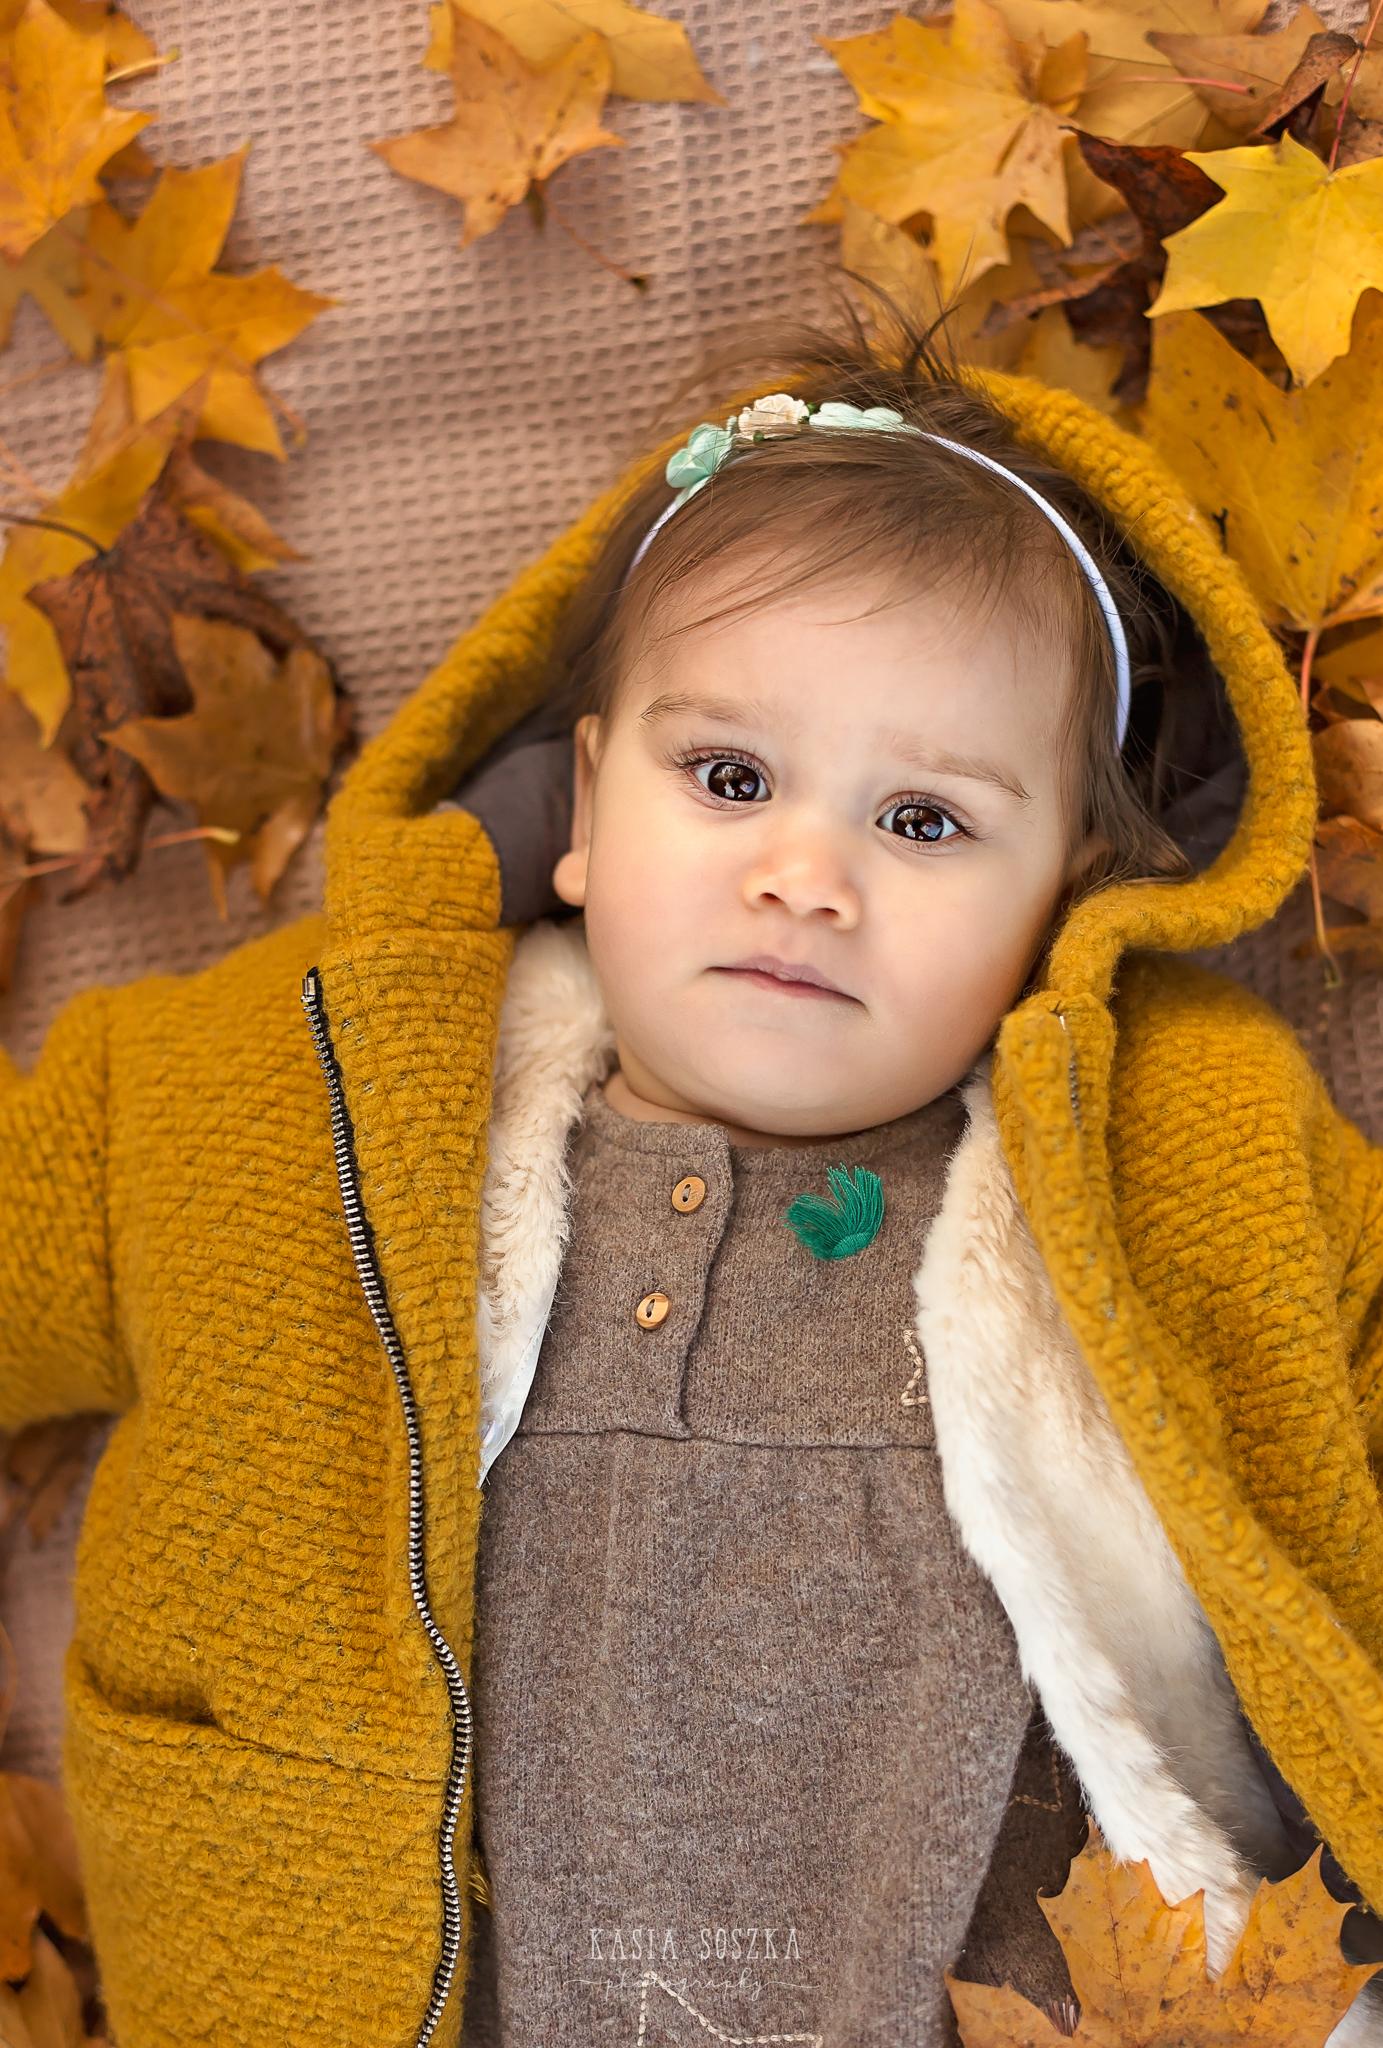 Baby milestone photography Leeds, York, Bradford, Harrogate: cute baby girl's first birthday portrait session. Autumn outdoor baby photo shoot in Leeds, Yorkshire